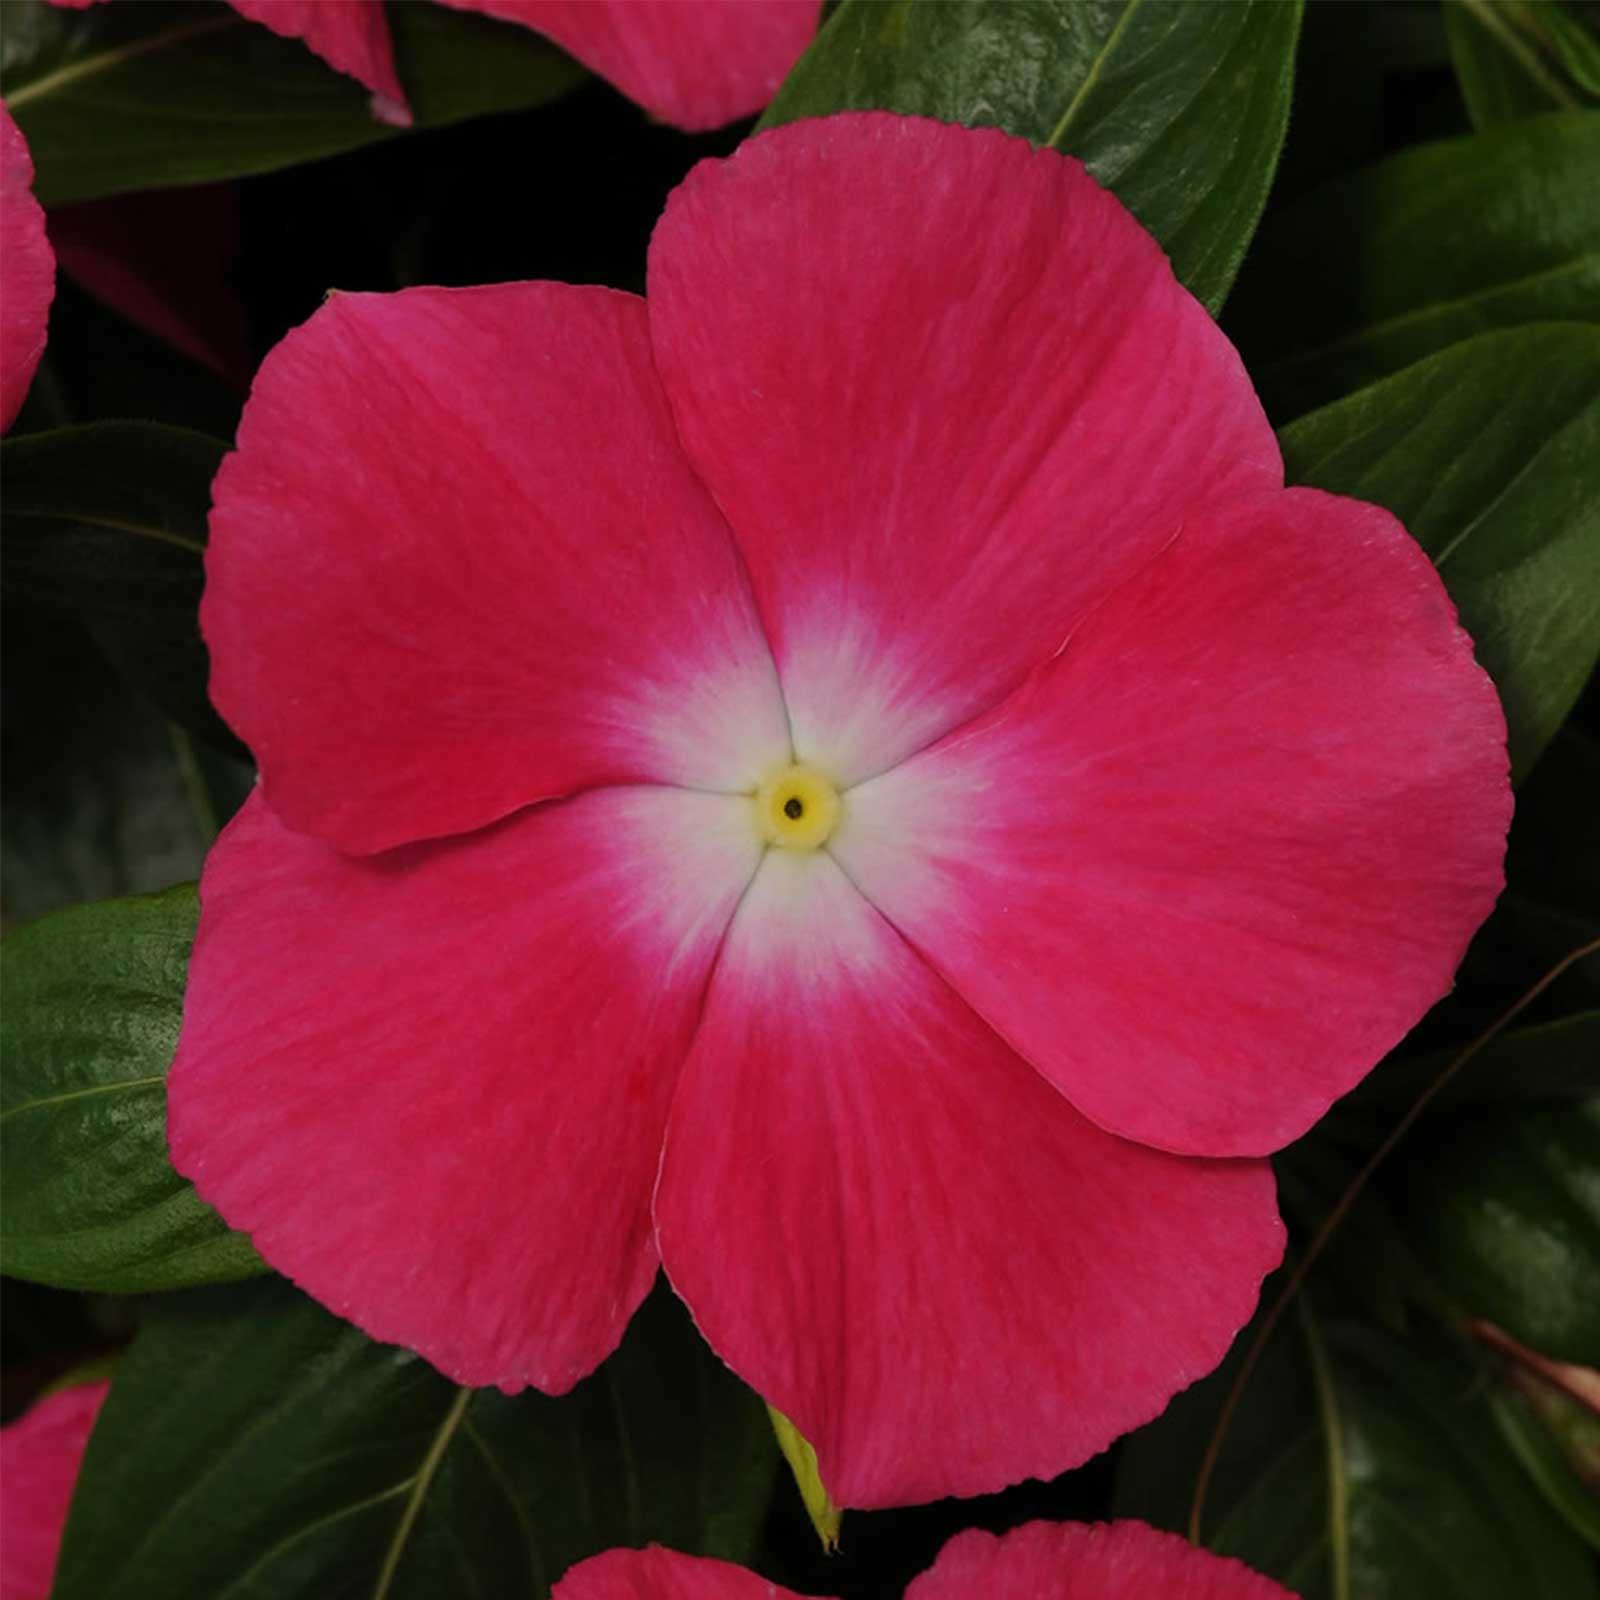 Vinca Flower Garden Seeds - Mediterranean XP Series - Color Mix - 100 Seeds - Annual Flower Gardening Seed